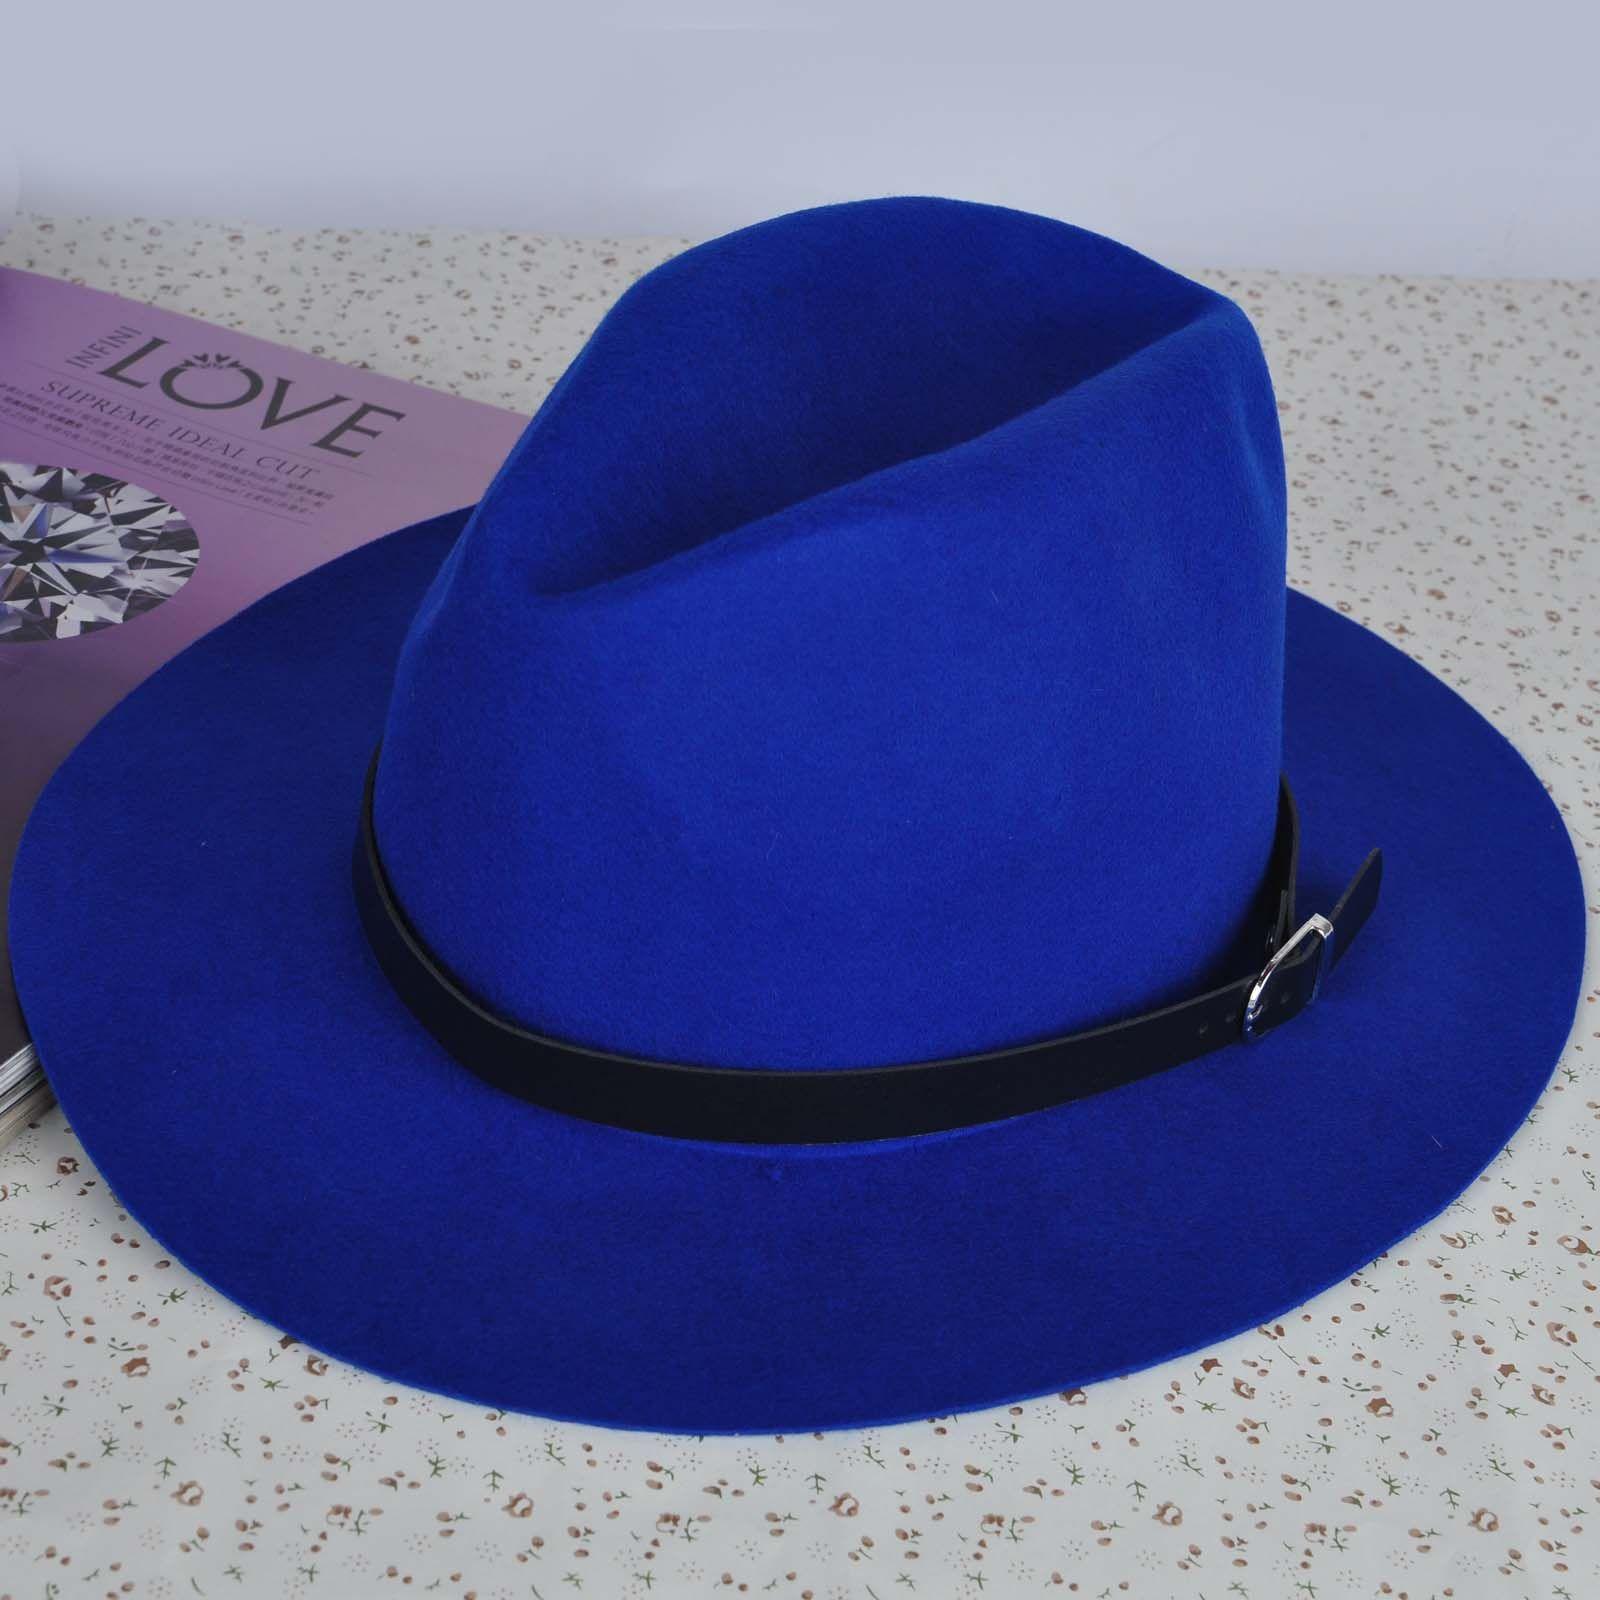 Blue Fedora hat